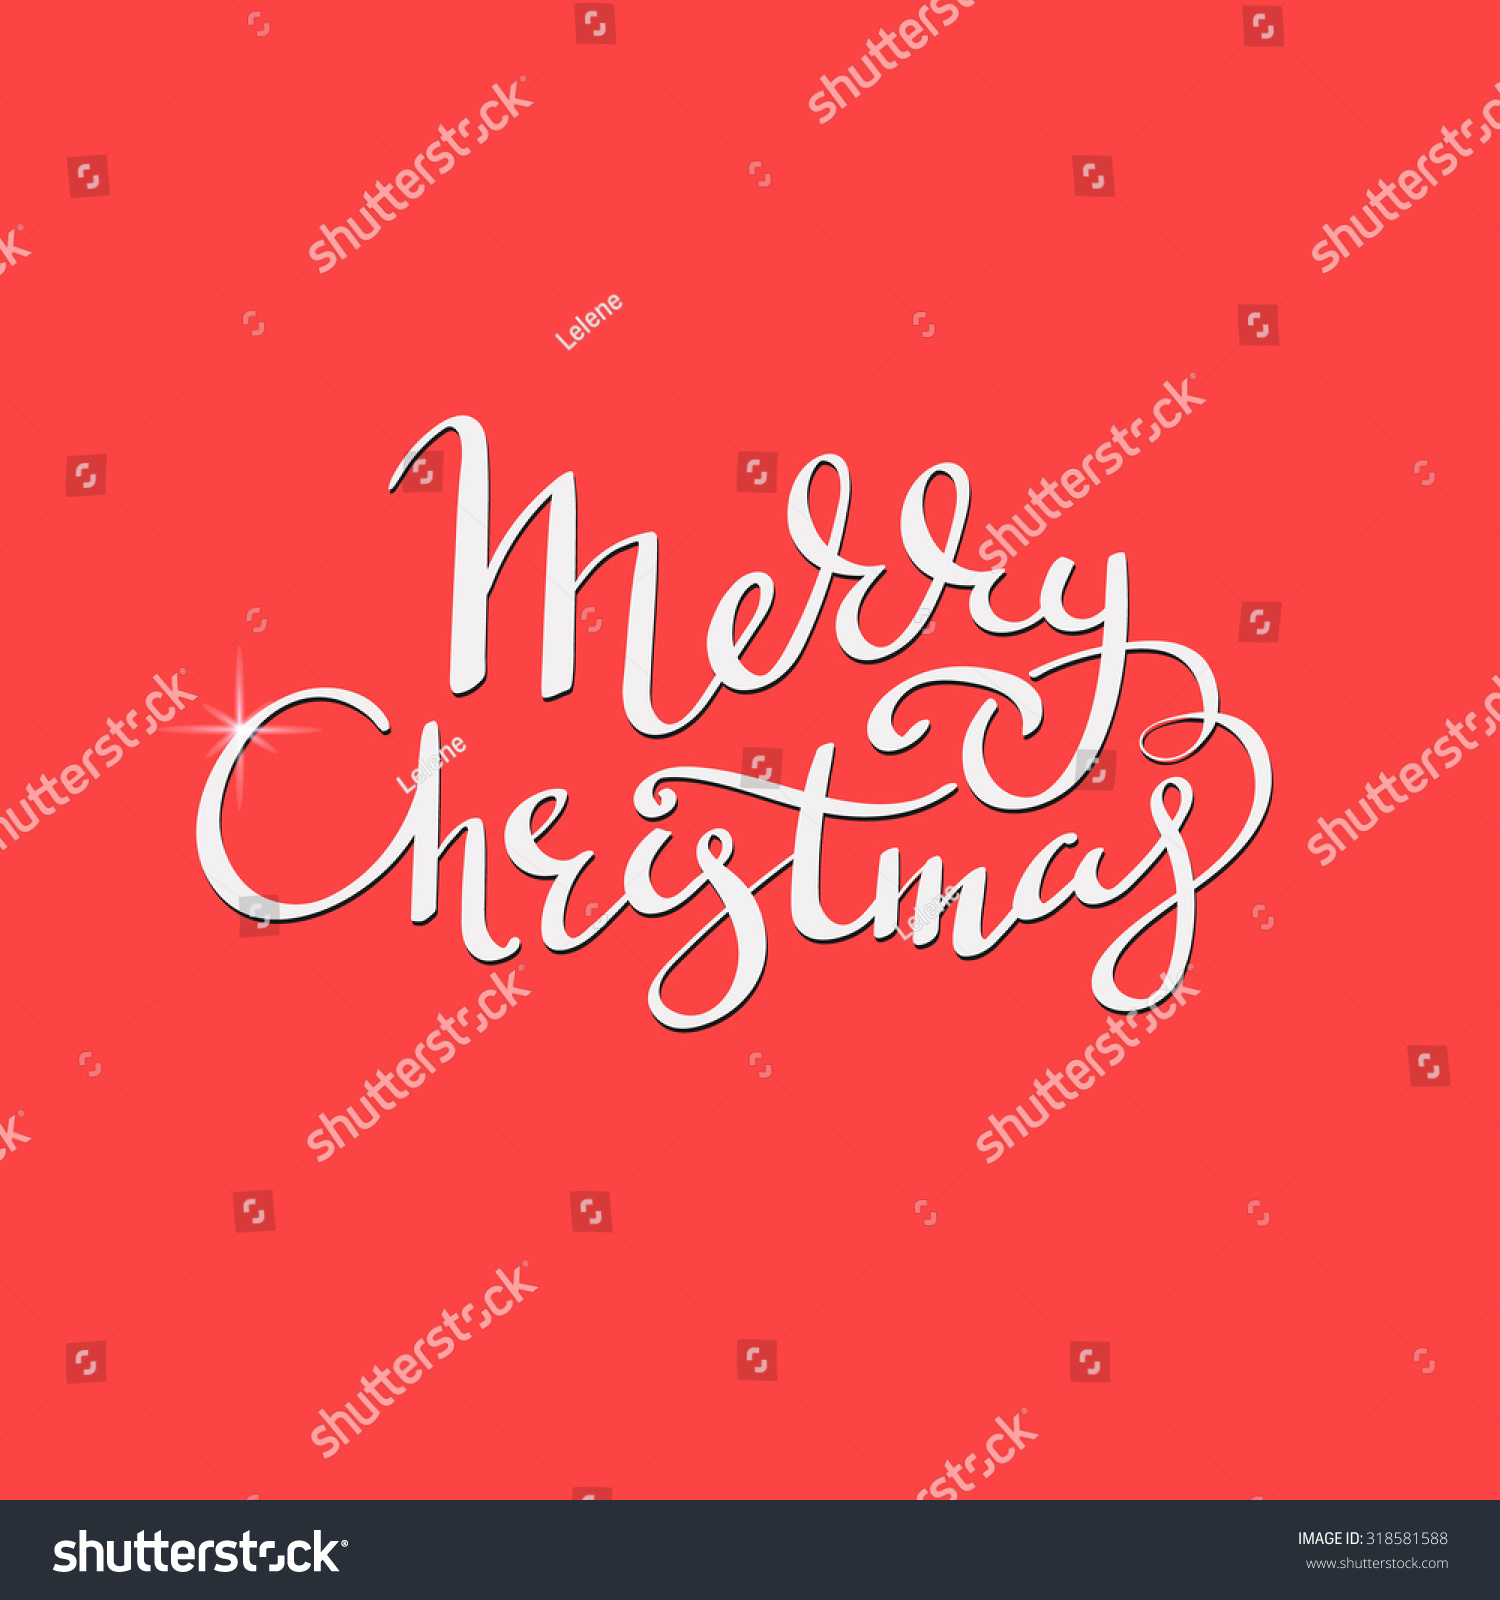 Merry christmas flourish decorative lettering calligraphy